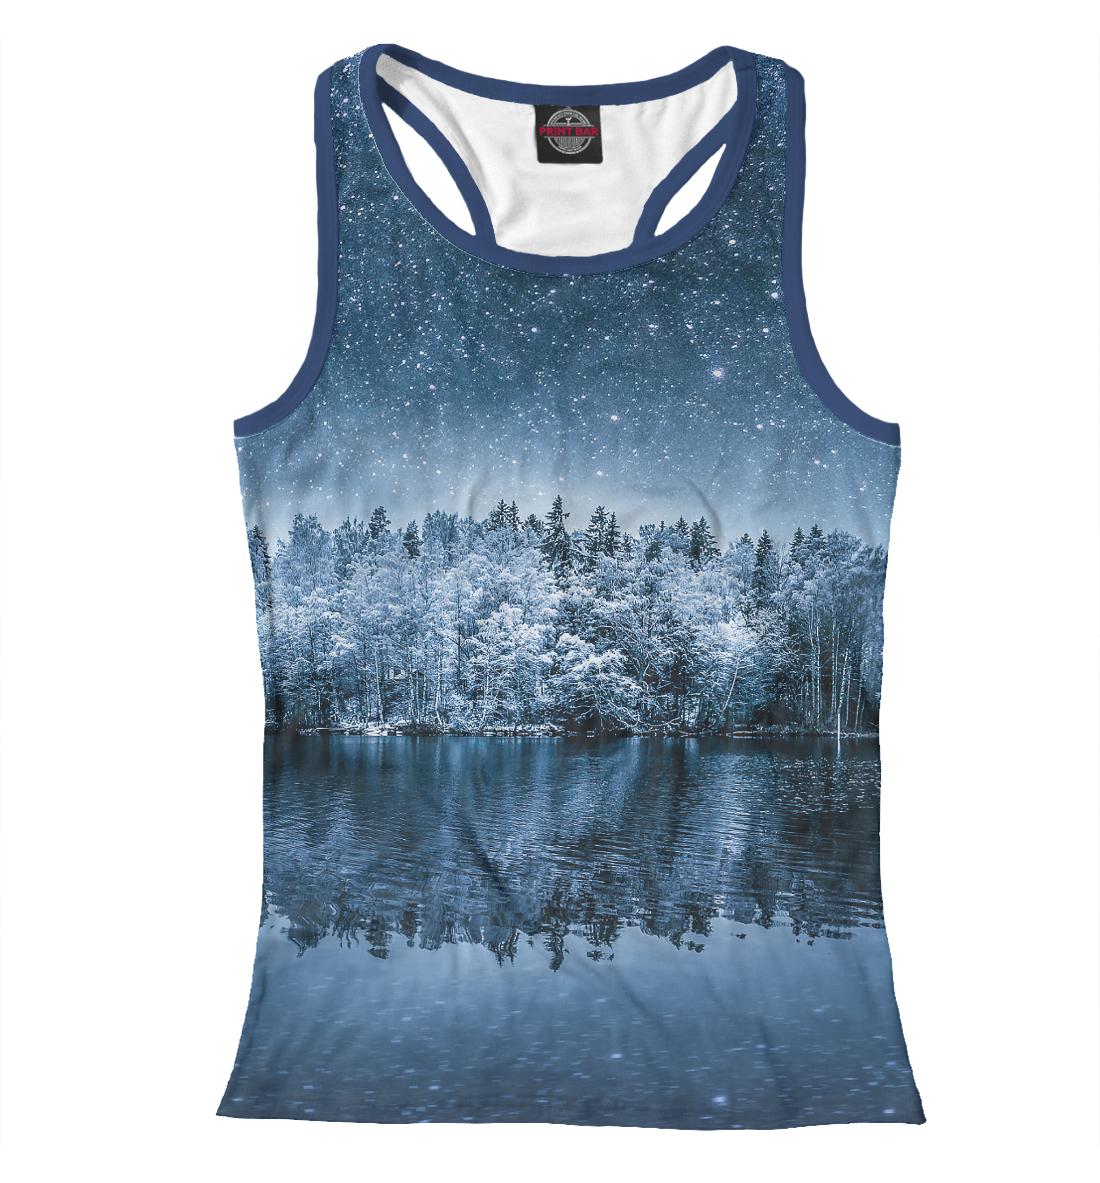 Купить Starry winter, Printbar, Майки борцовки, PEY-915278-mayb-1